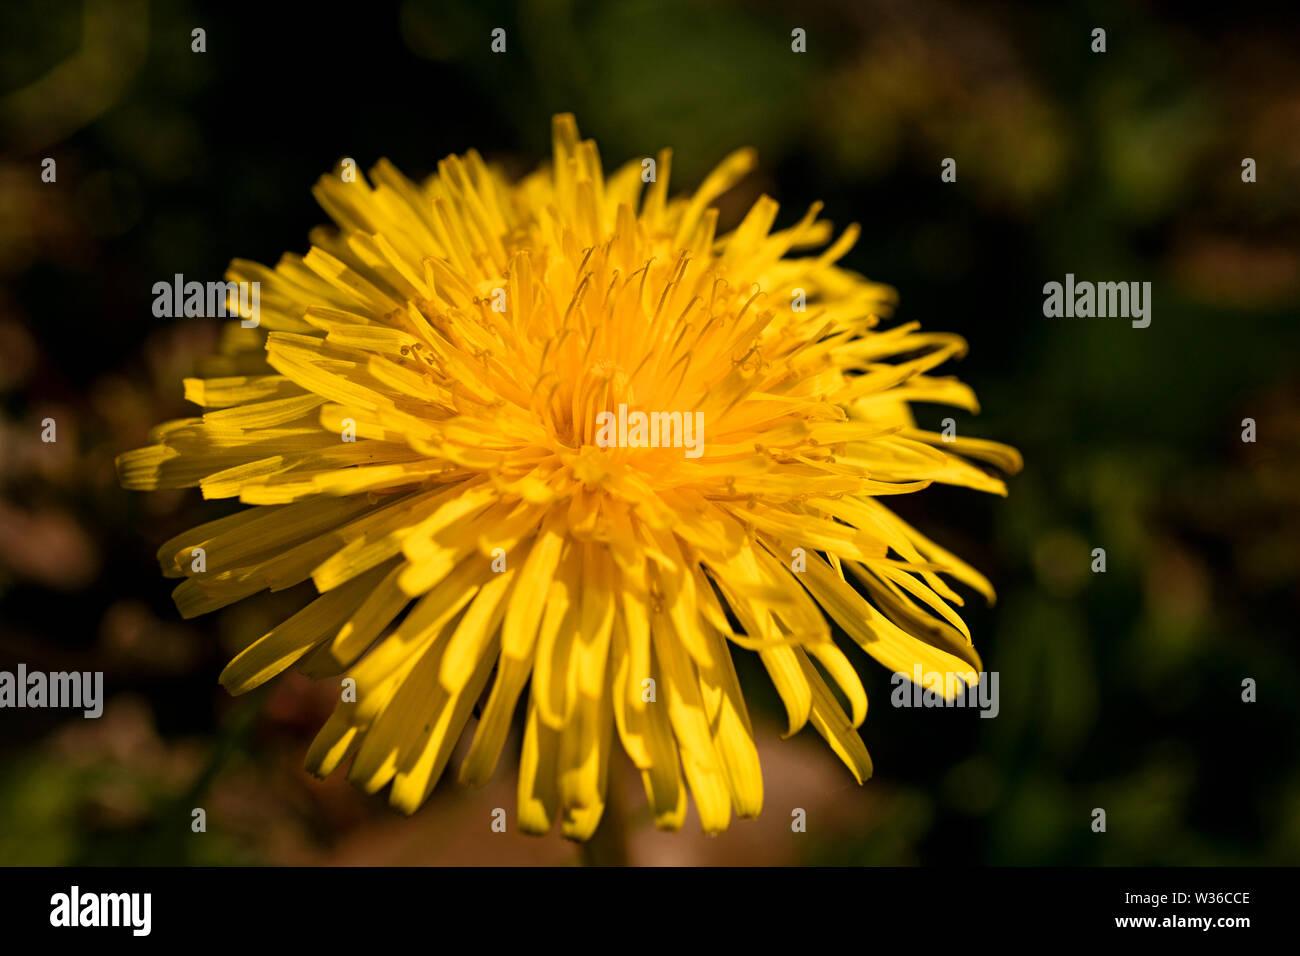 Yellow macro flower background wallpaper high quality prints fine art. Stock Photo